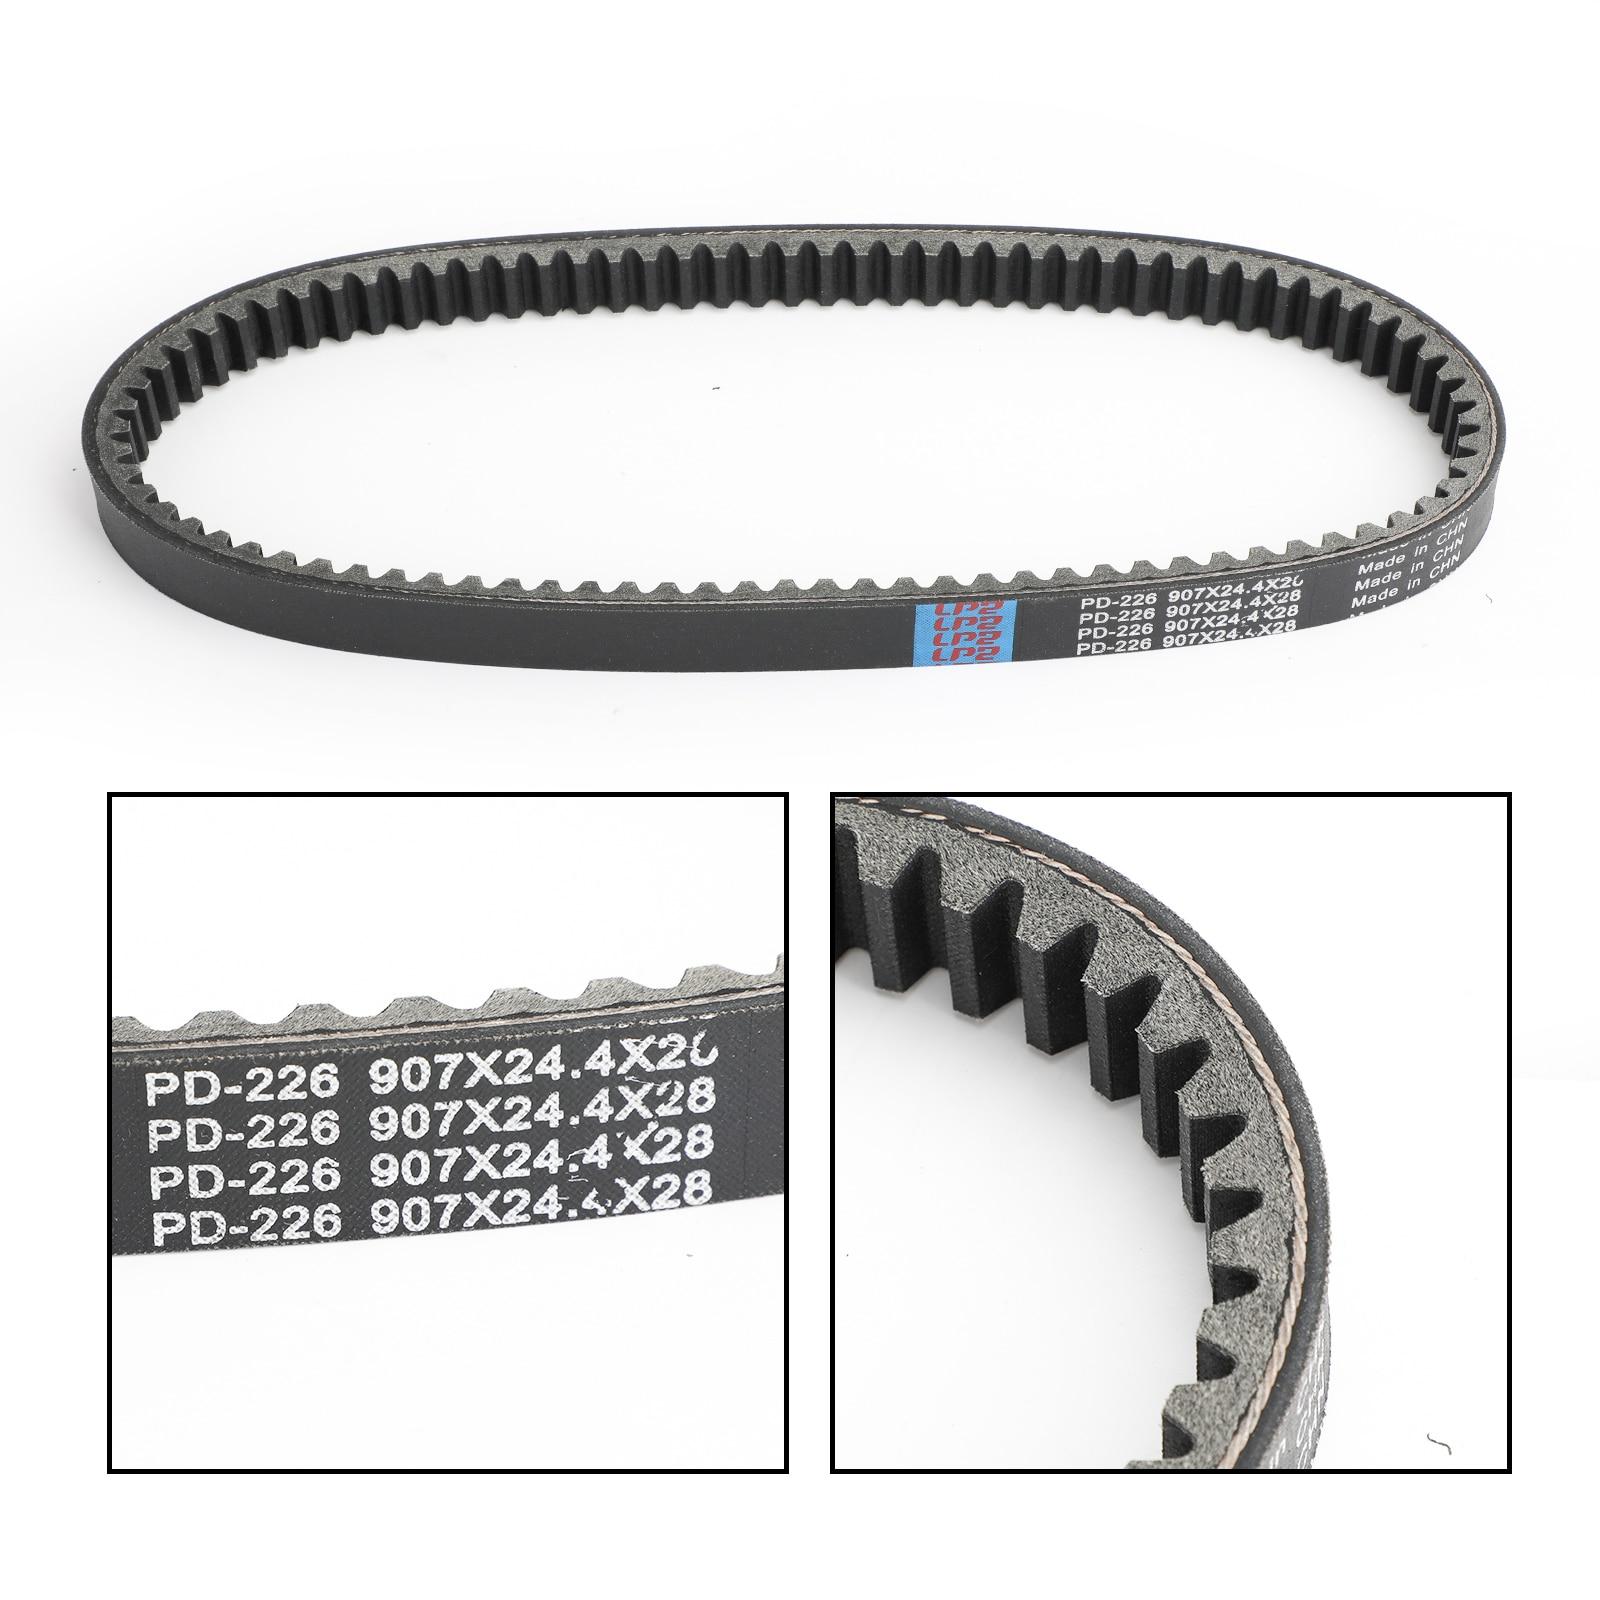 Artudatech Primary Drive Clutch Belt For SYM GTS JOYMAX 300 RV270 RV300 GTS300  EFI EVO LM30W1-7 EFI EVO LN30A1-6